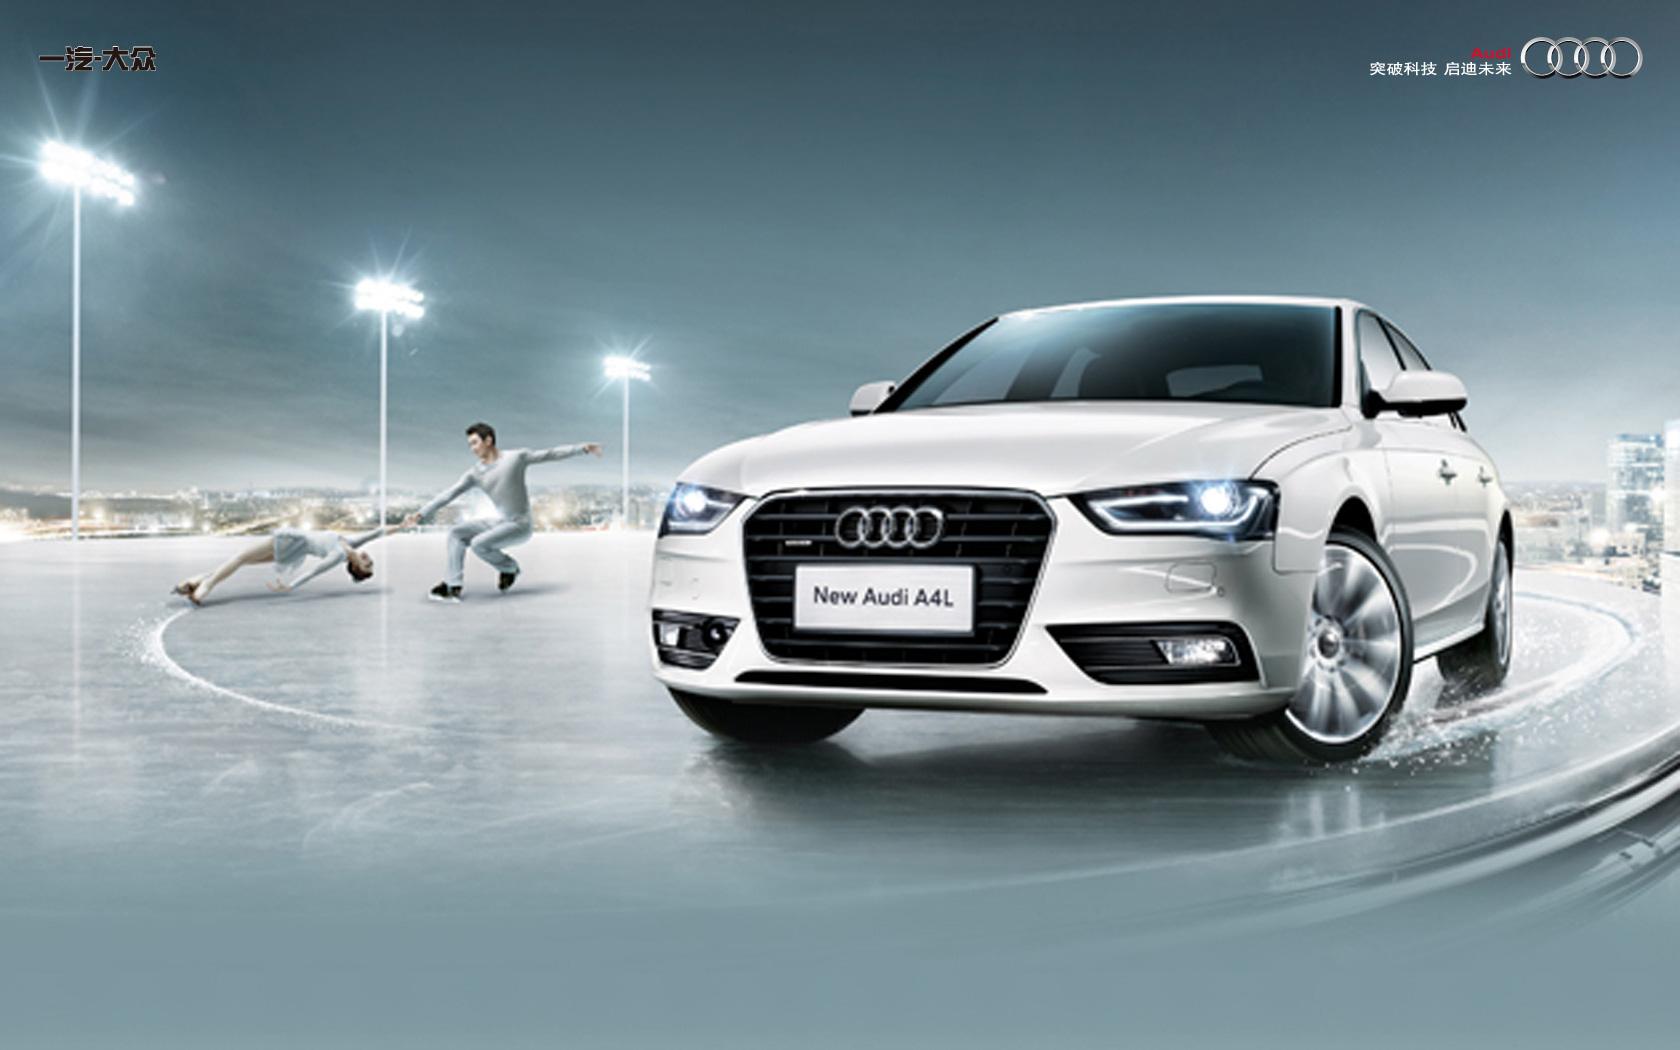 Audi A4l Specs Amp Photos 2012 2013 2014 2015 2016